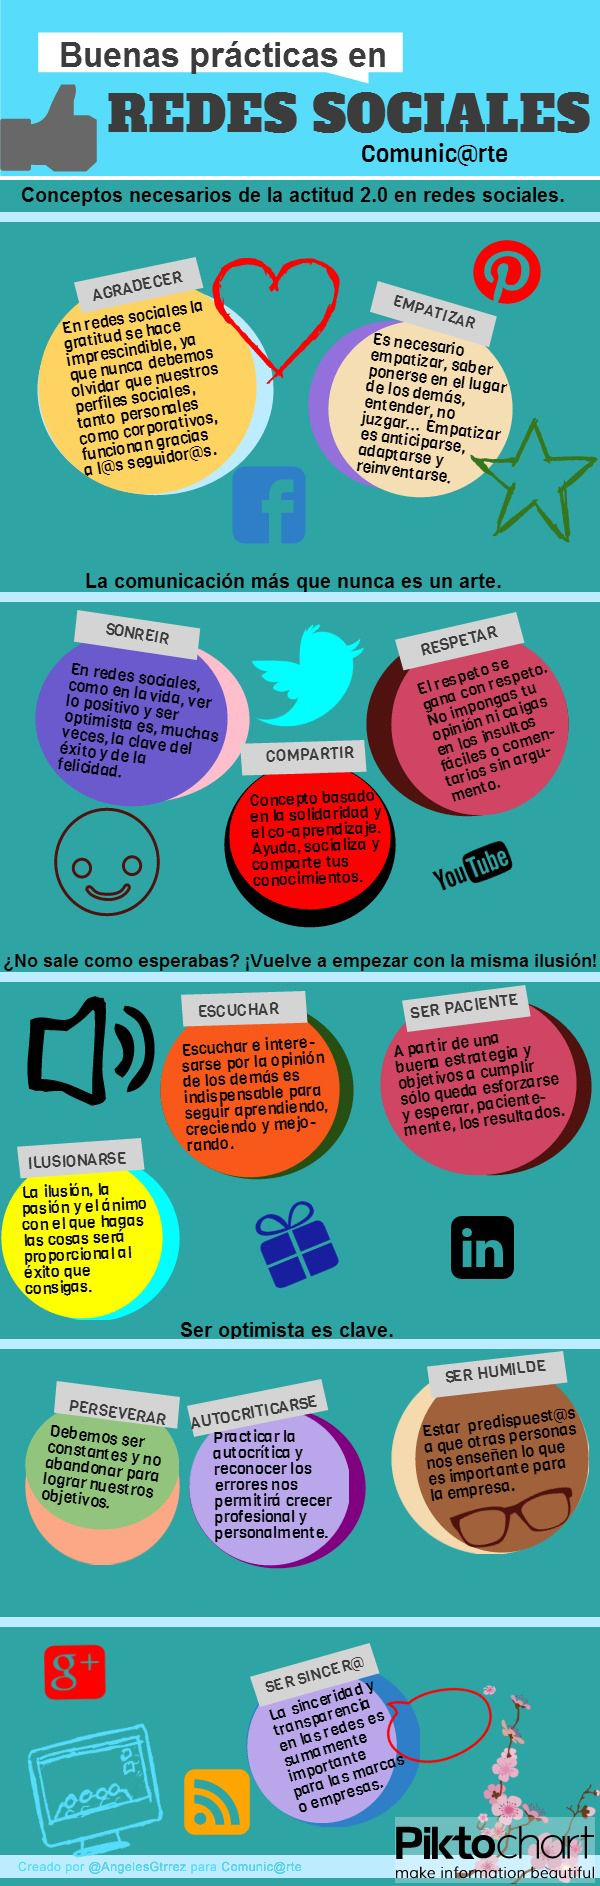 Buenas prácticas en Redes Sociales #infografia